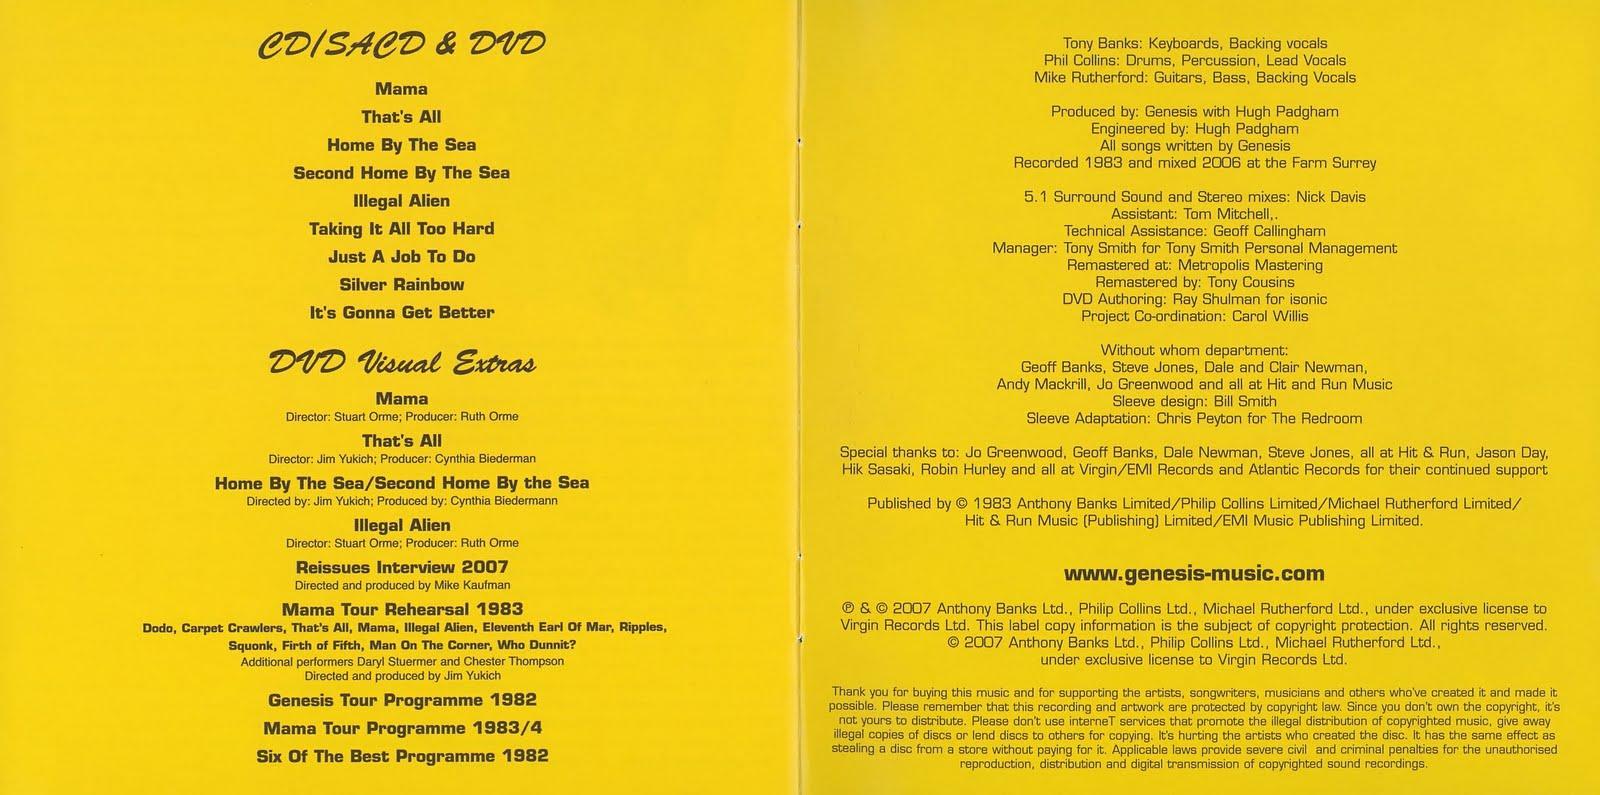 lampu mercury: Genesis - Genesis 1983 (DVD-AUDIO SACD)